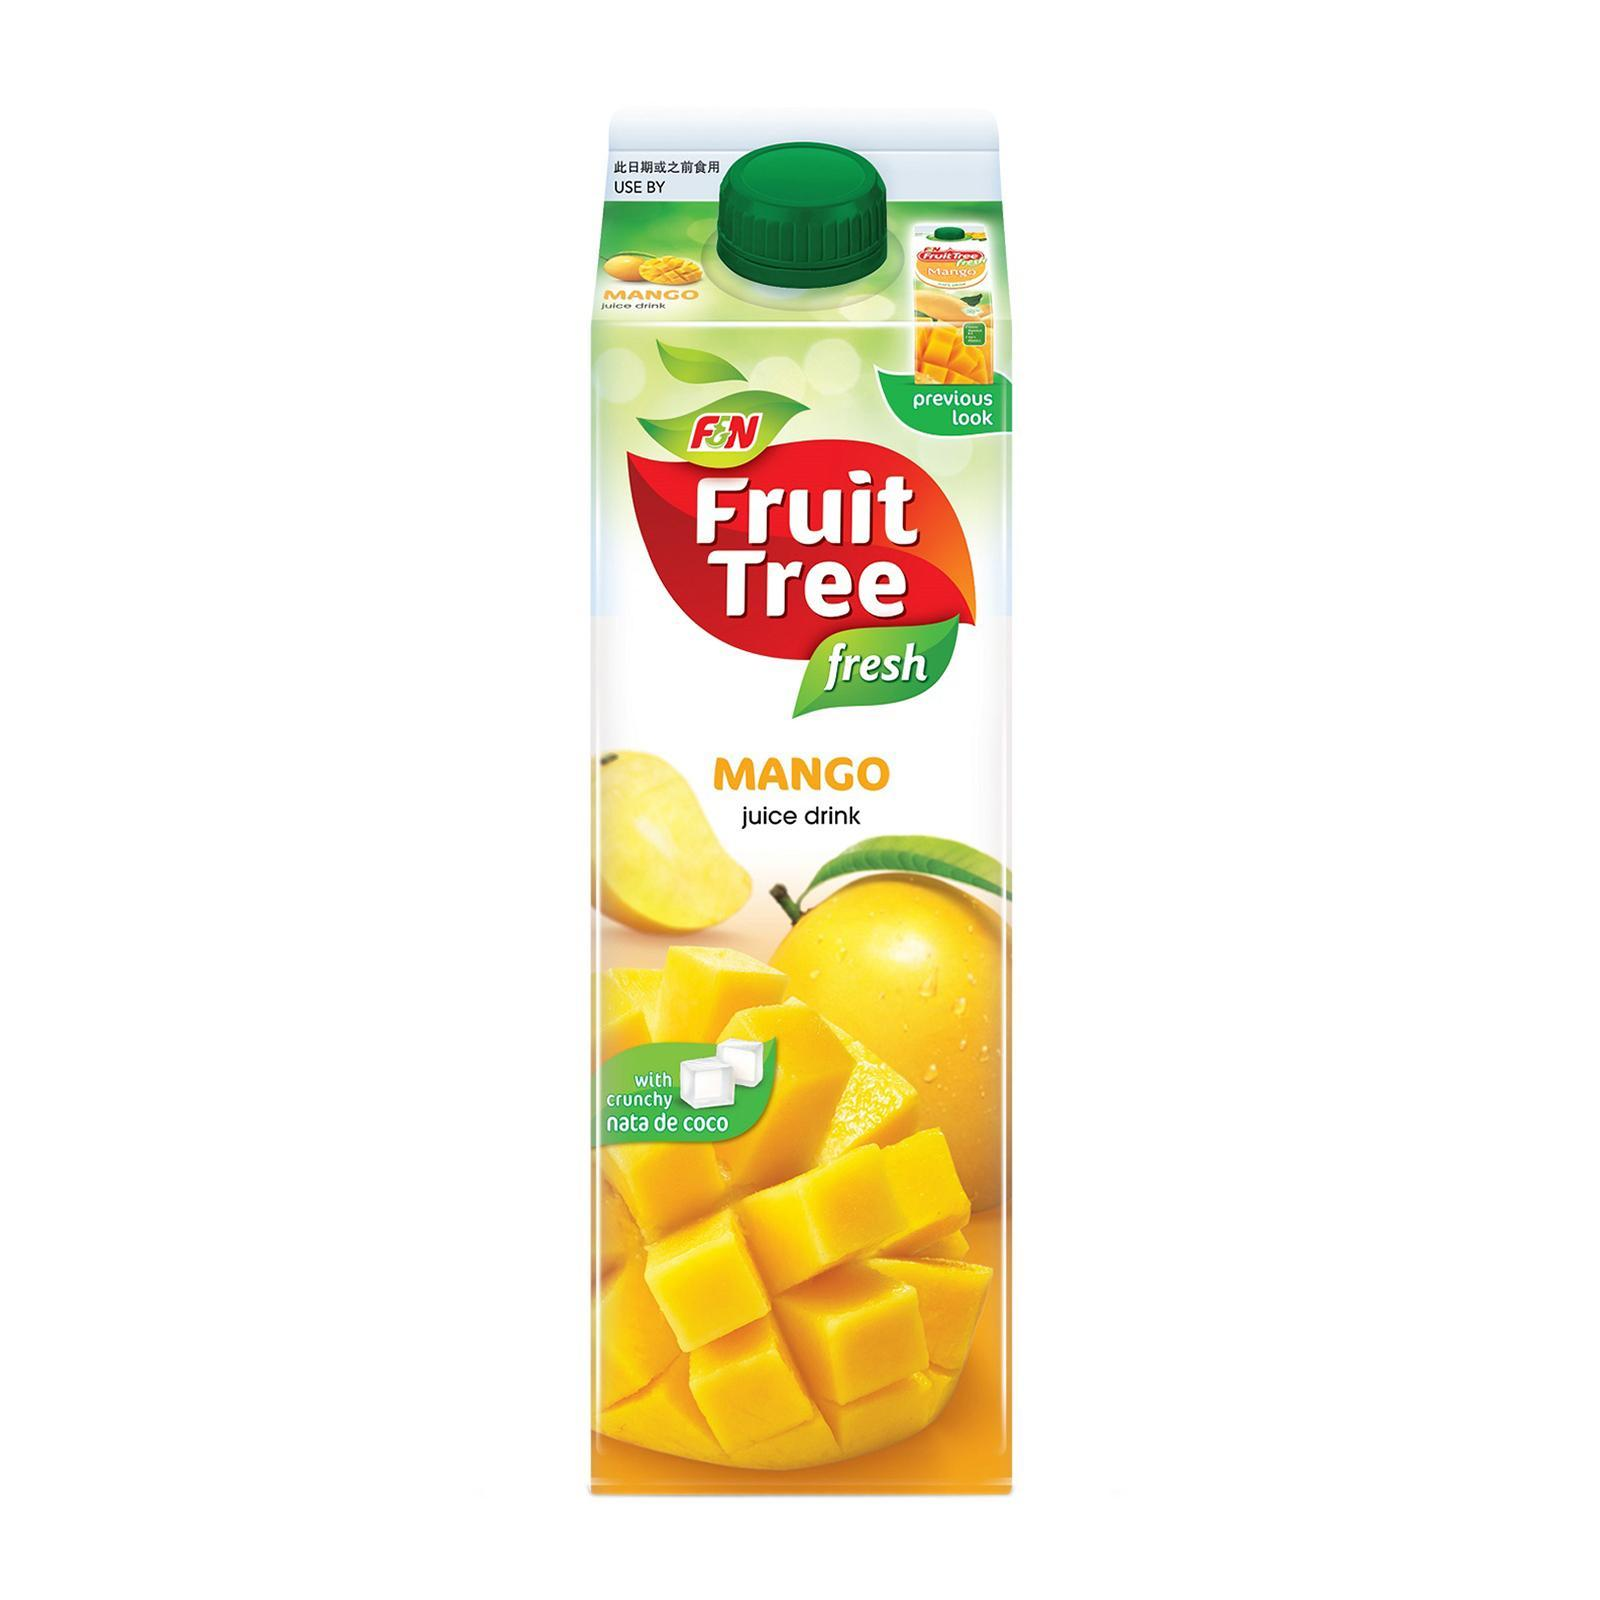 F&n Fruit Tree Fresh Mango With Nata De Coco Juice By Redmart.